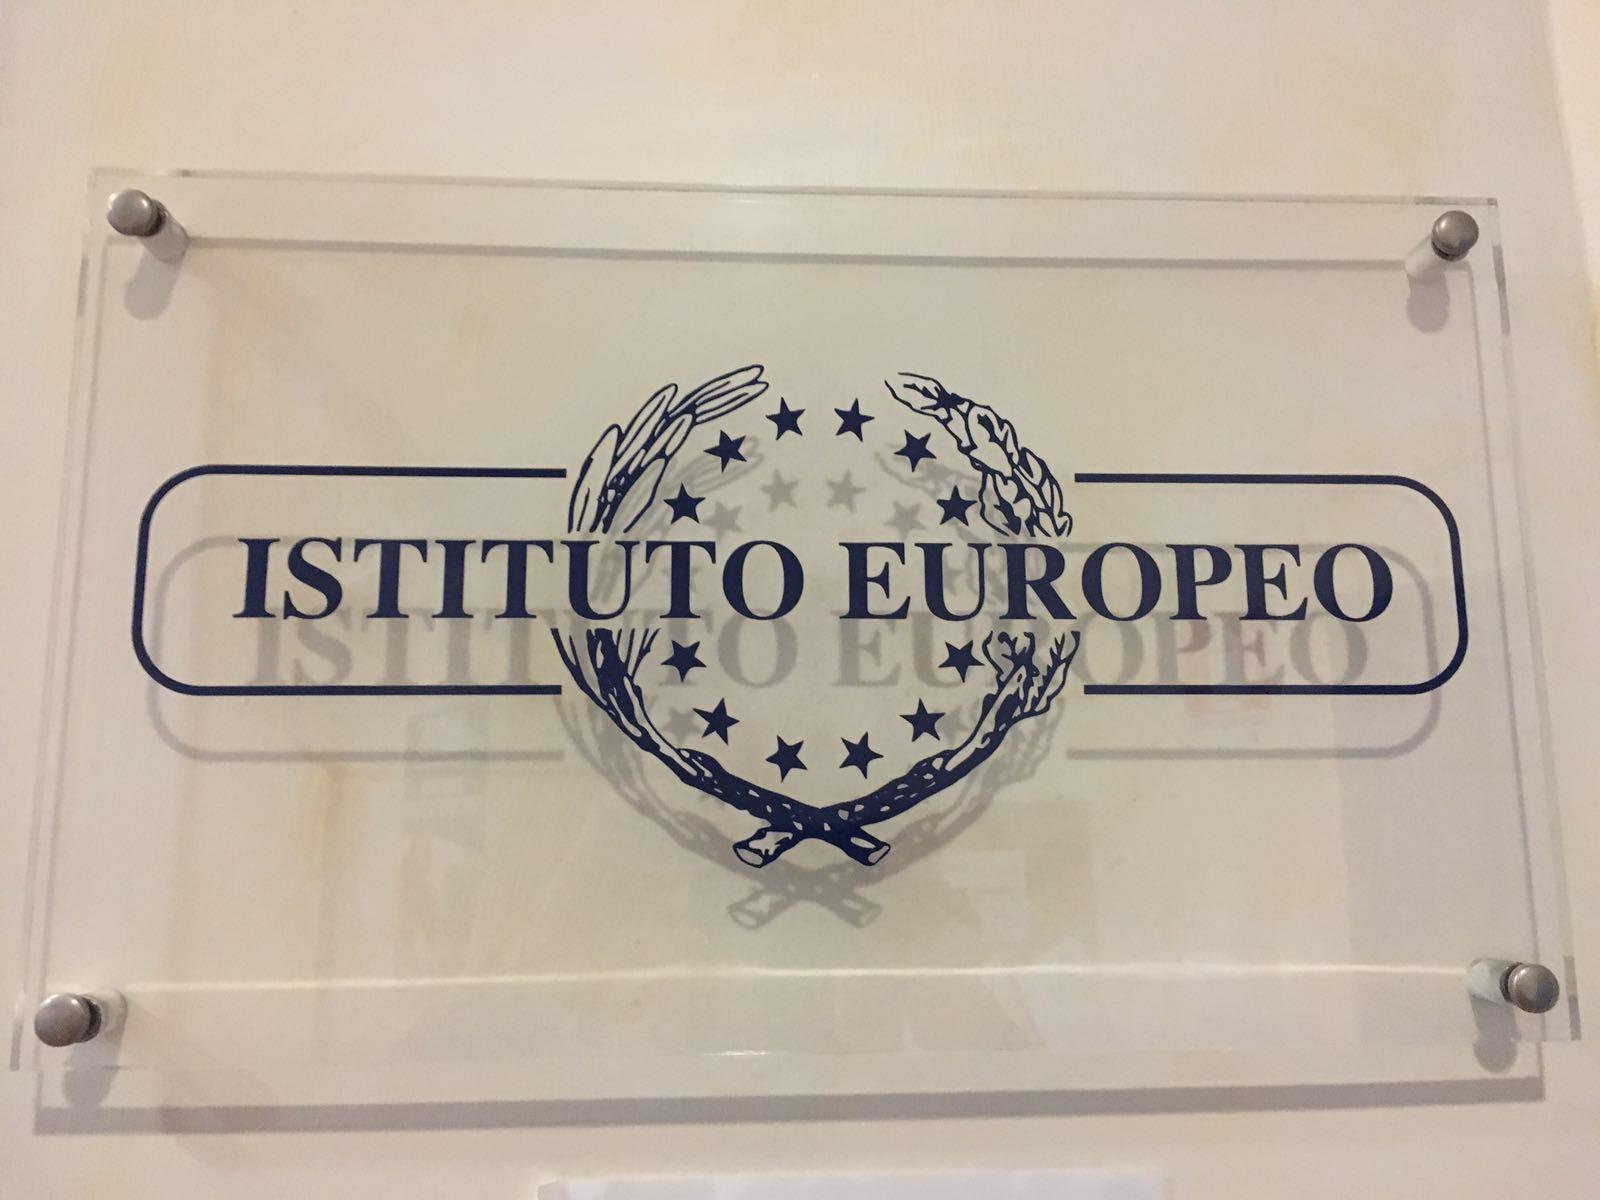 istituto europeo